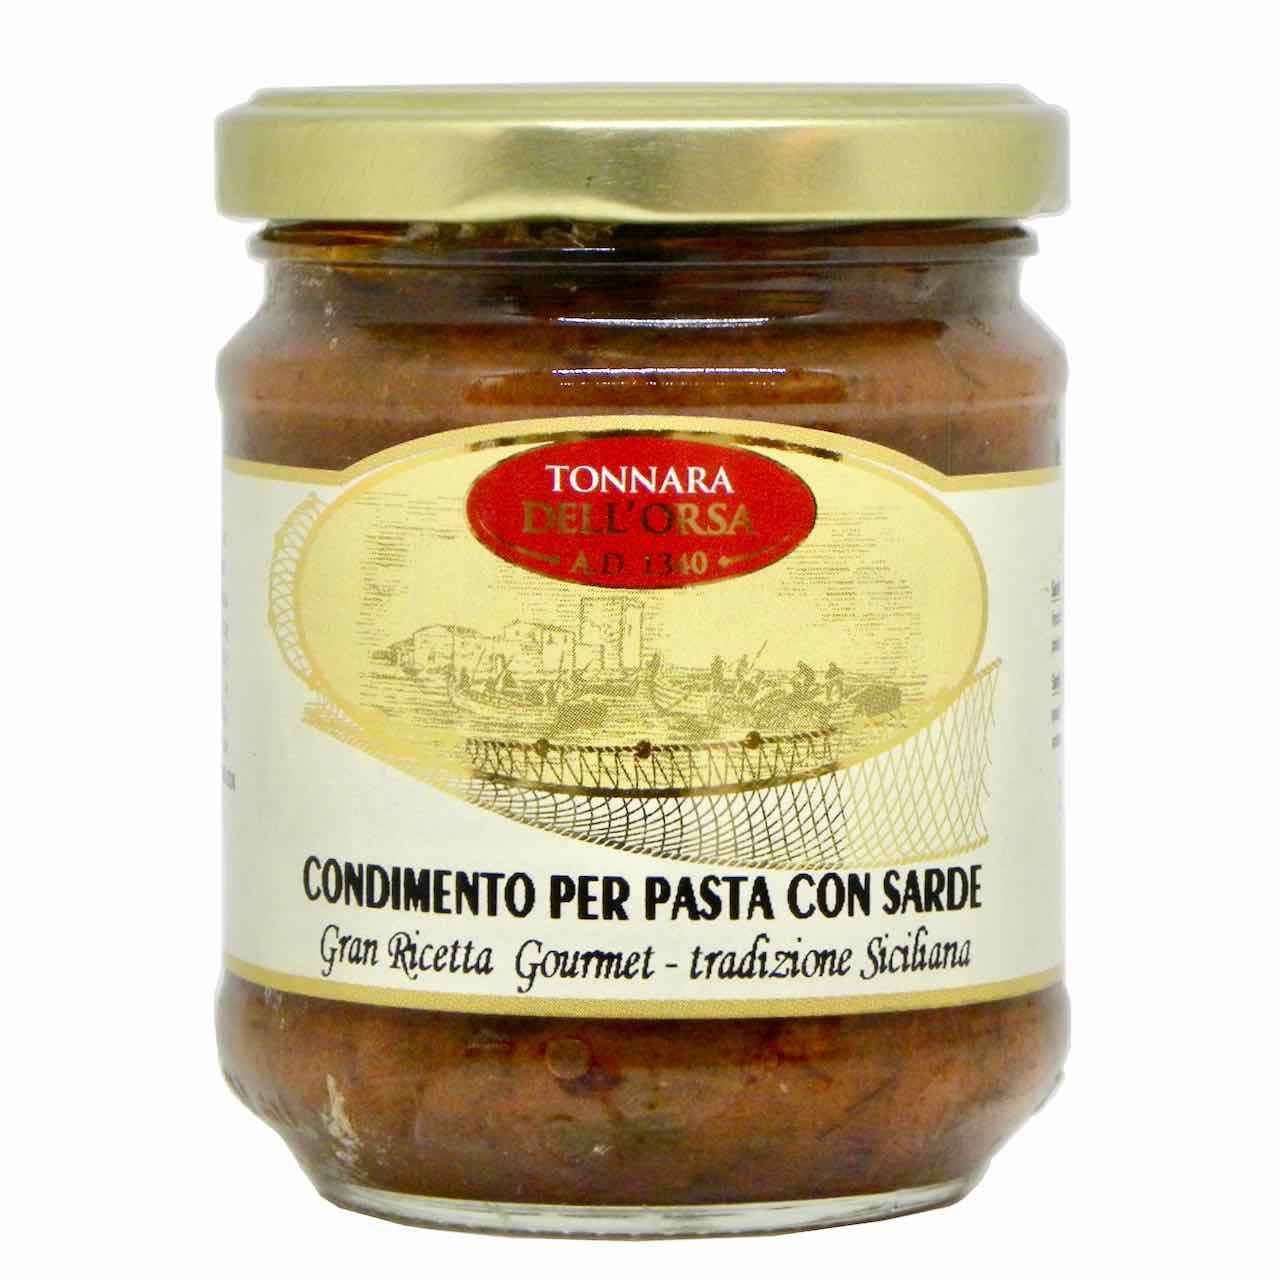 Condimento per pasta con sarde – Mattina – Nutritalia – Gustorotondo – spesa online – buono sano artigiano